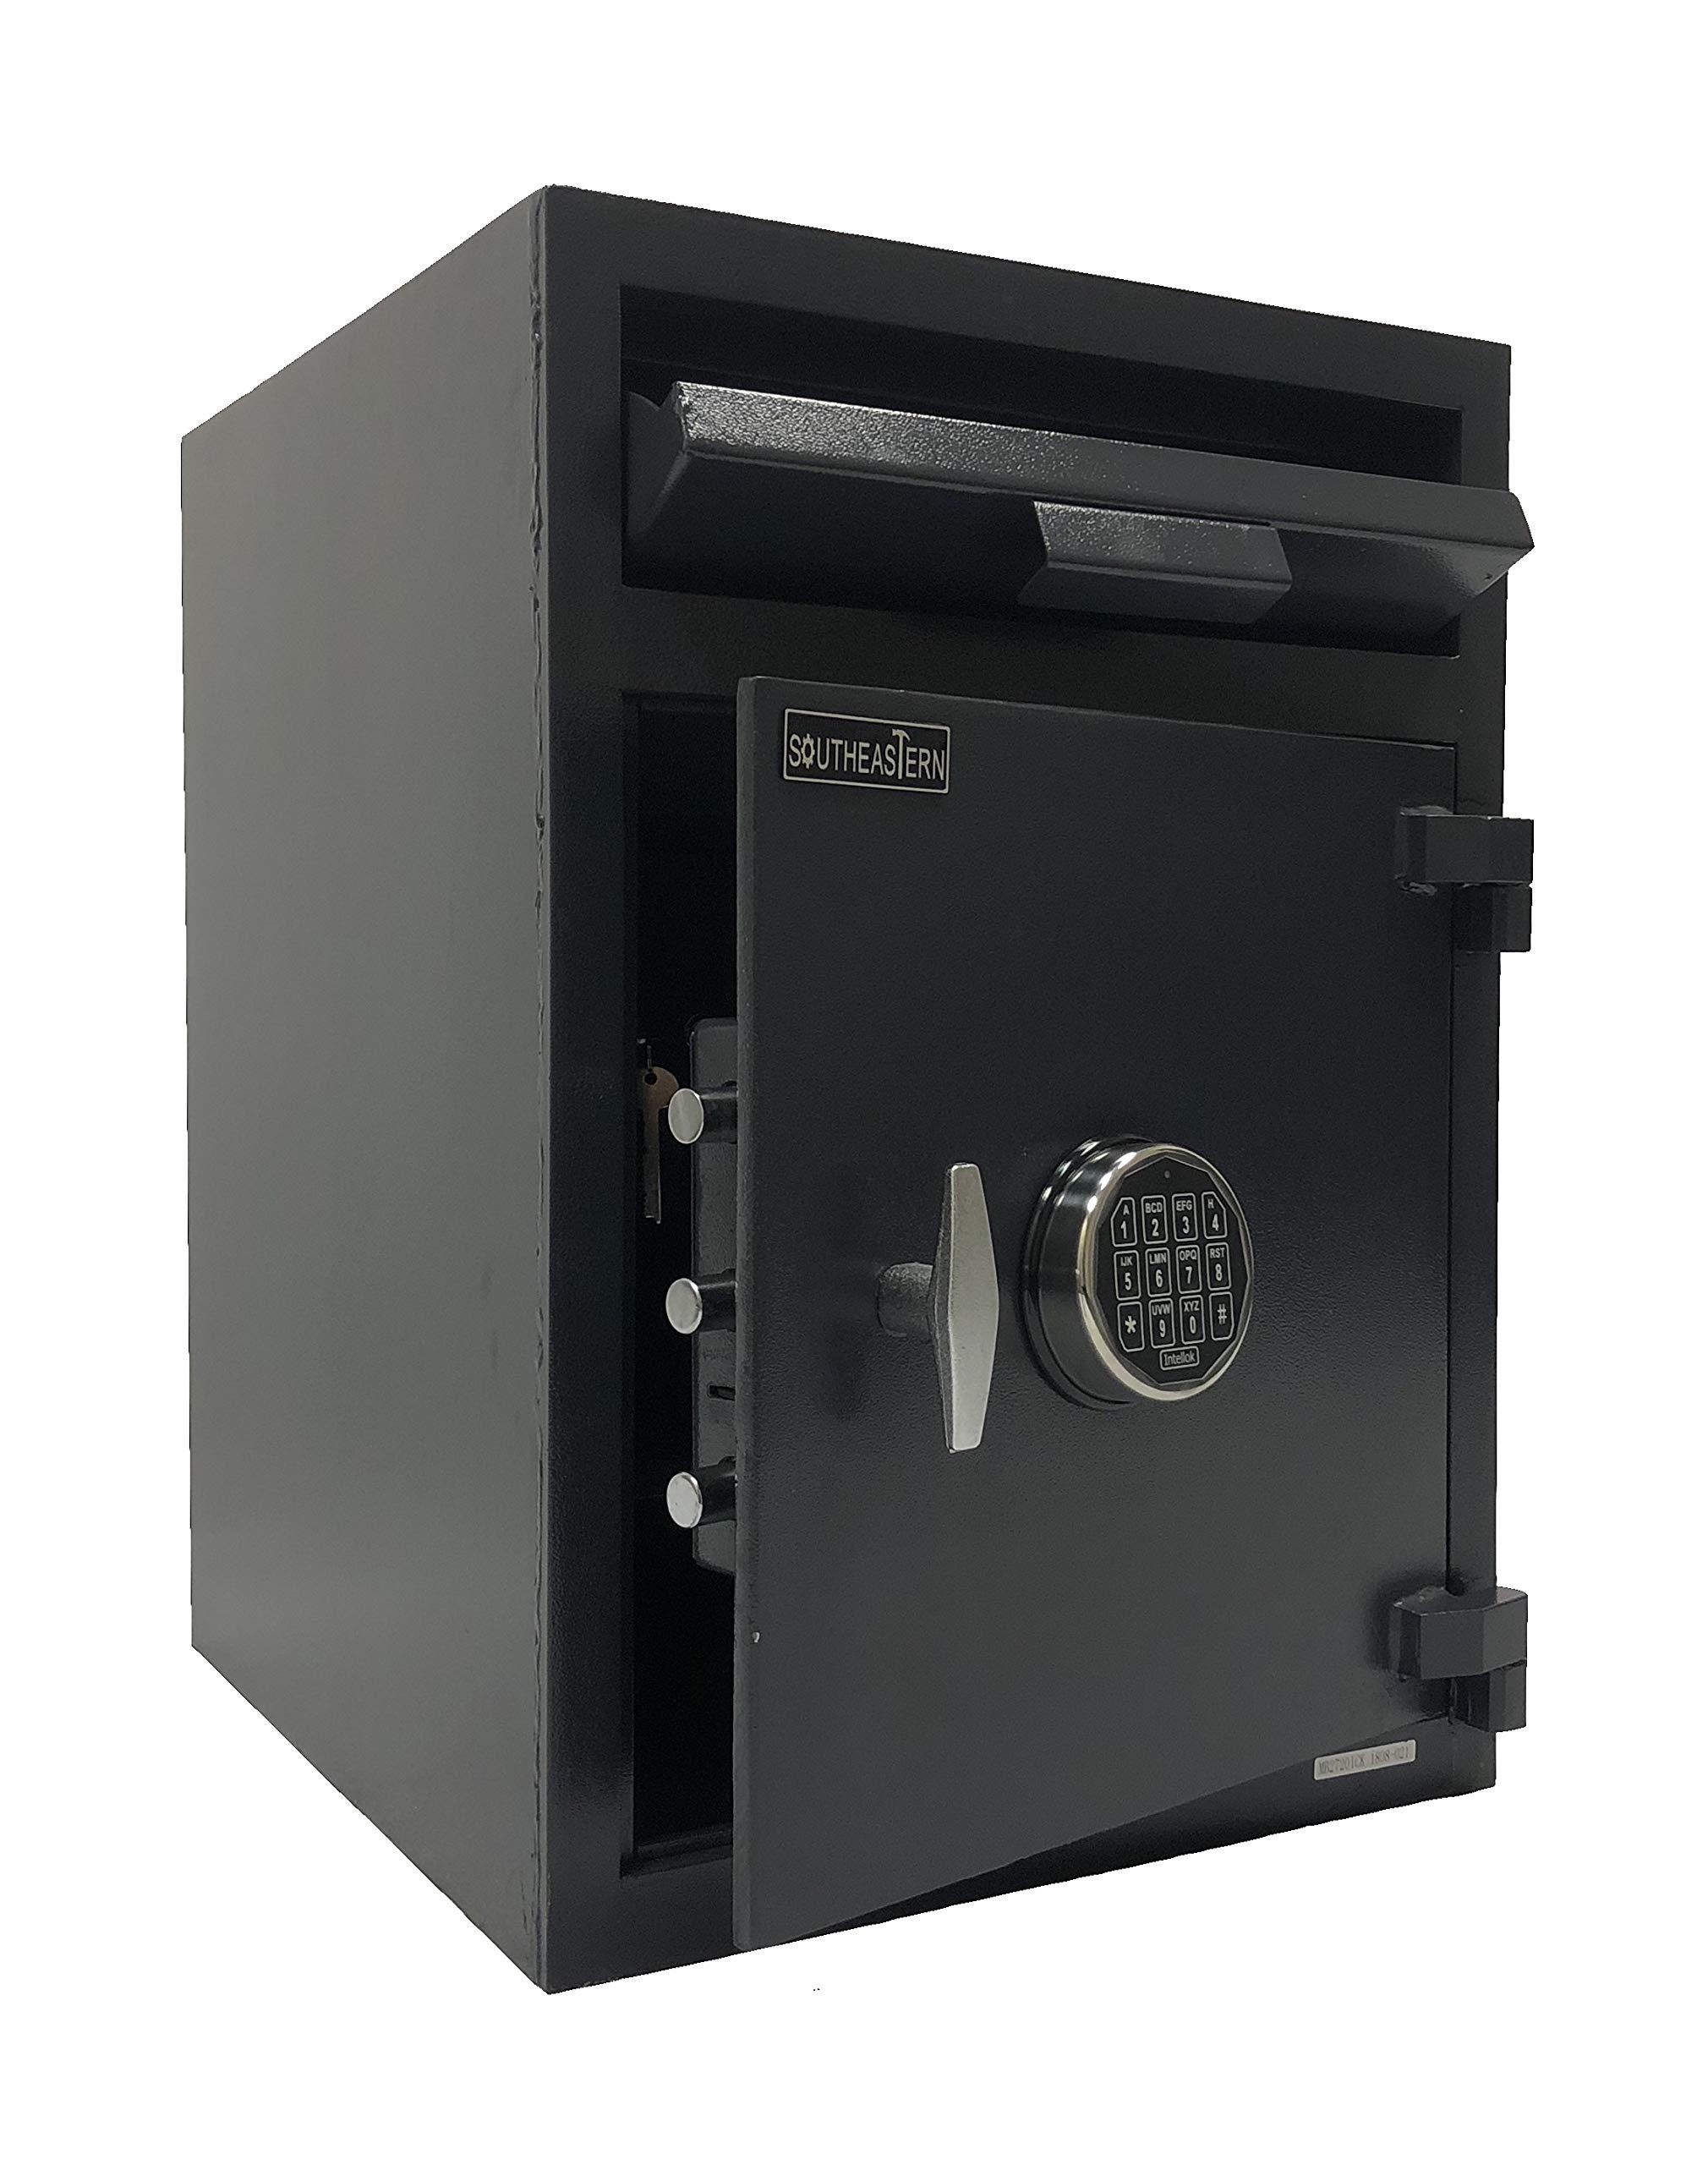 Southeastern F2820ILK Cashbag Drop Depository Safe with Quick Digital Lock w/Inner Dual Key Locker by Southeastern (Image #1)